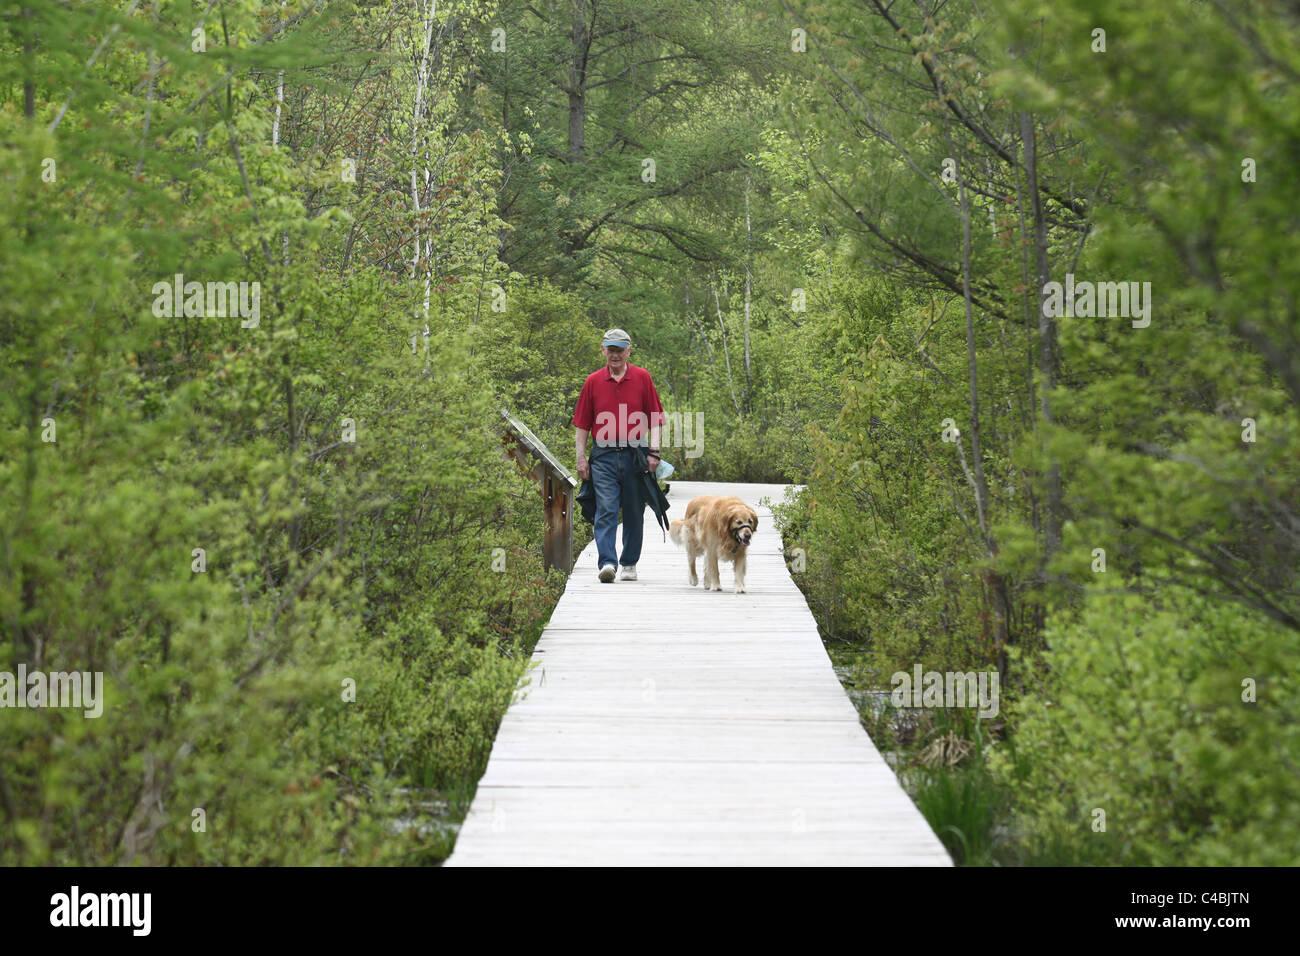 One man in red shirt walking golden lab dog in wilderness Stock Photo